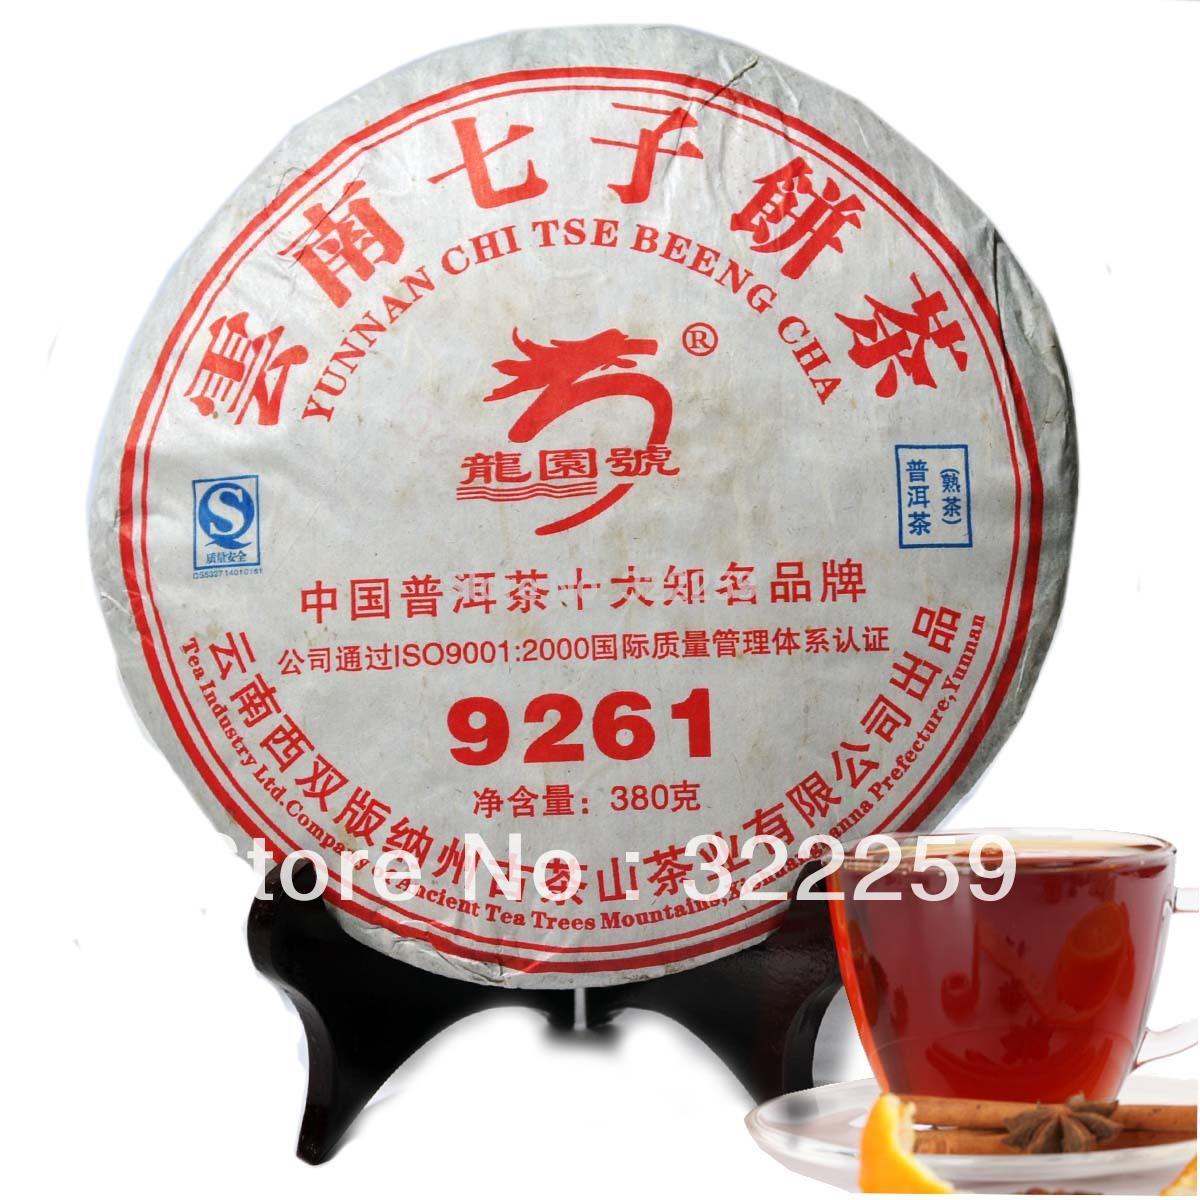 GREENFIELD 2007 yr Premium Quality 9261 Cooked Ripe Shu Puerh Pu er Pu Erh Tea